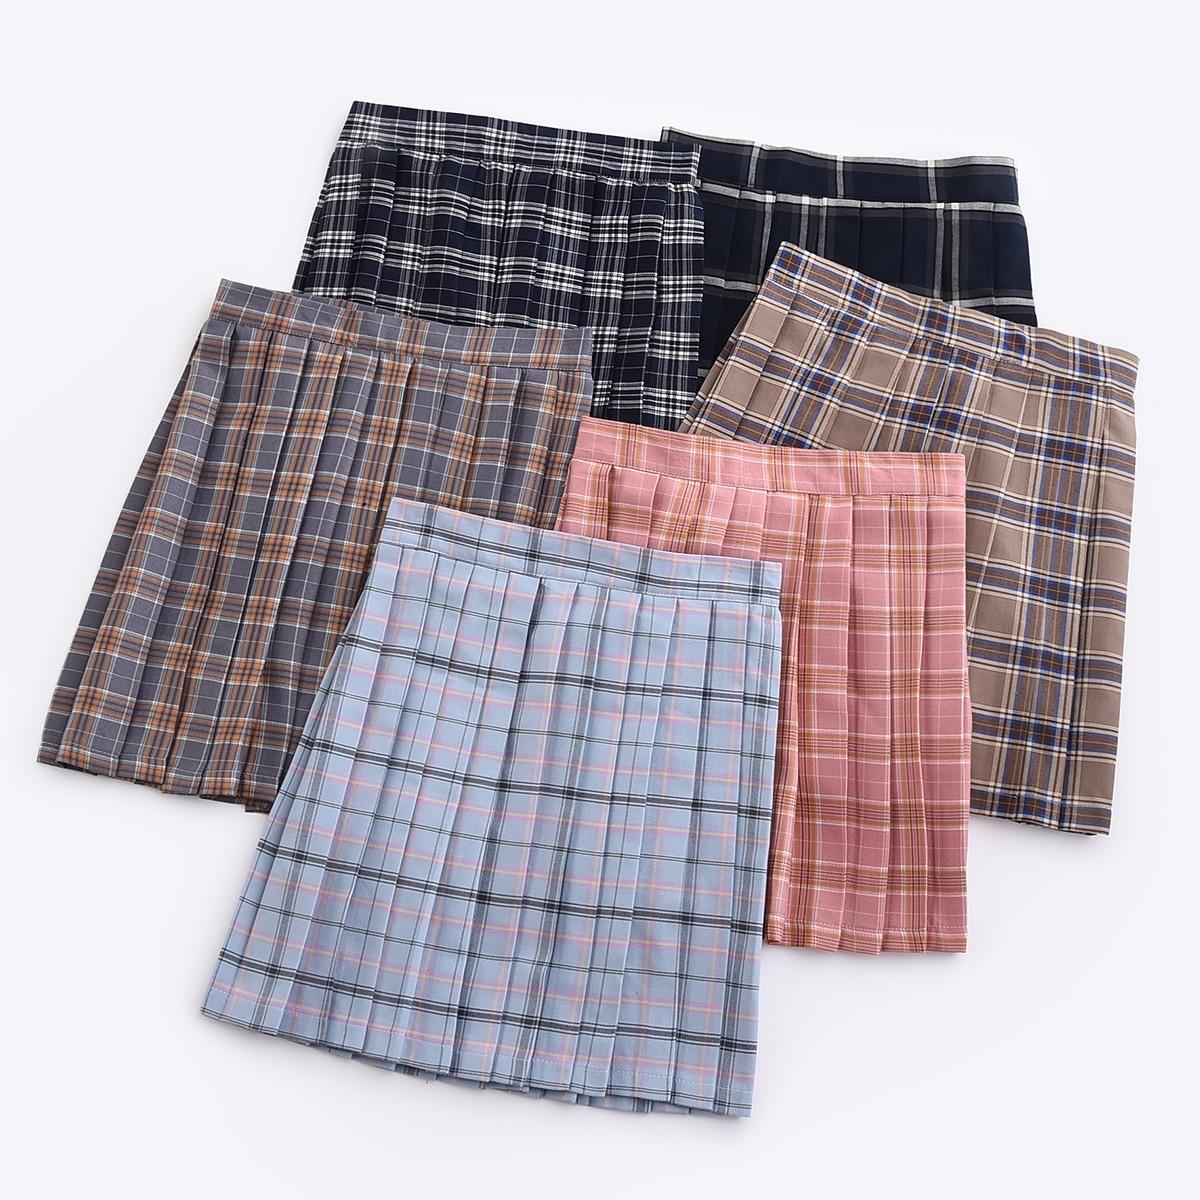 Hot Japanese Korean Version Short Skirts School Girl Pleated Half Skirt School Uniform Cosplay Student Jk Academy 17 Colors 5xl